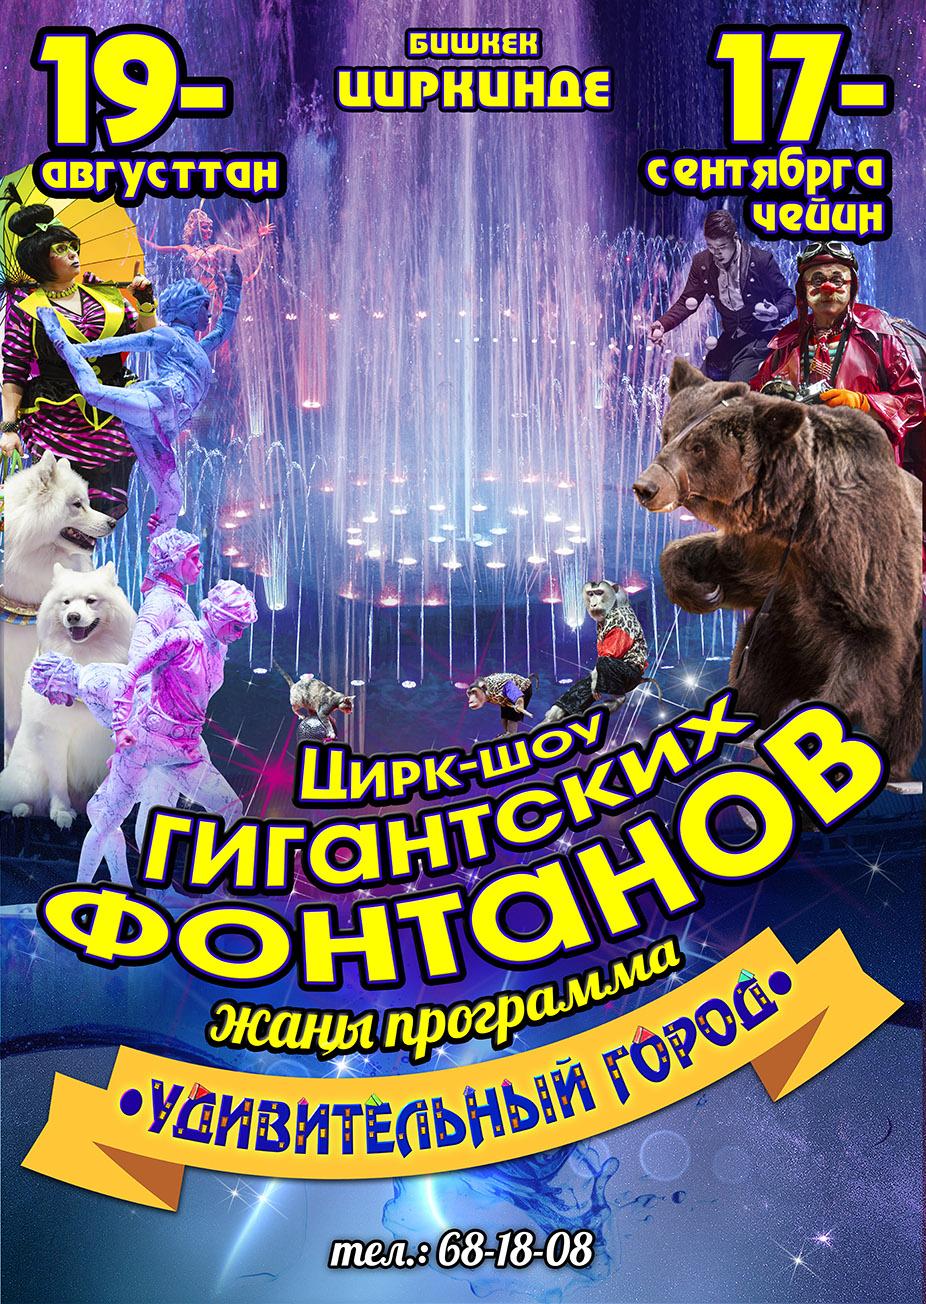 Цирк-Шоу